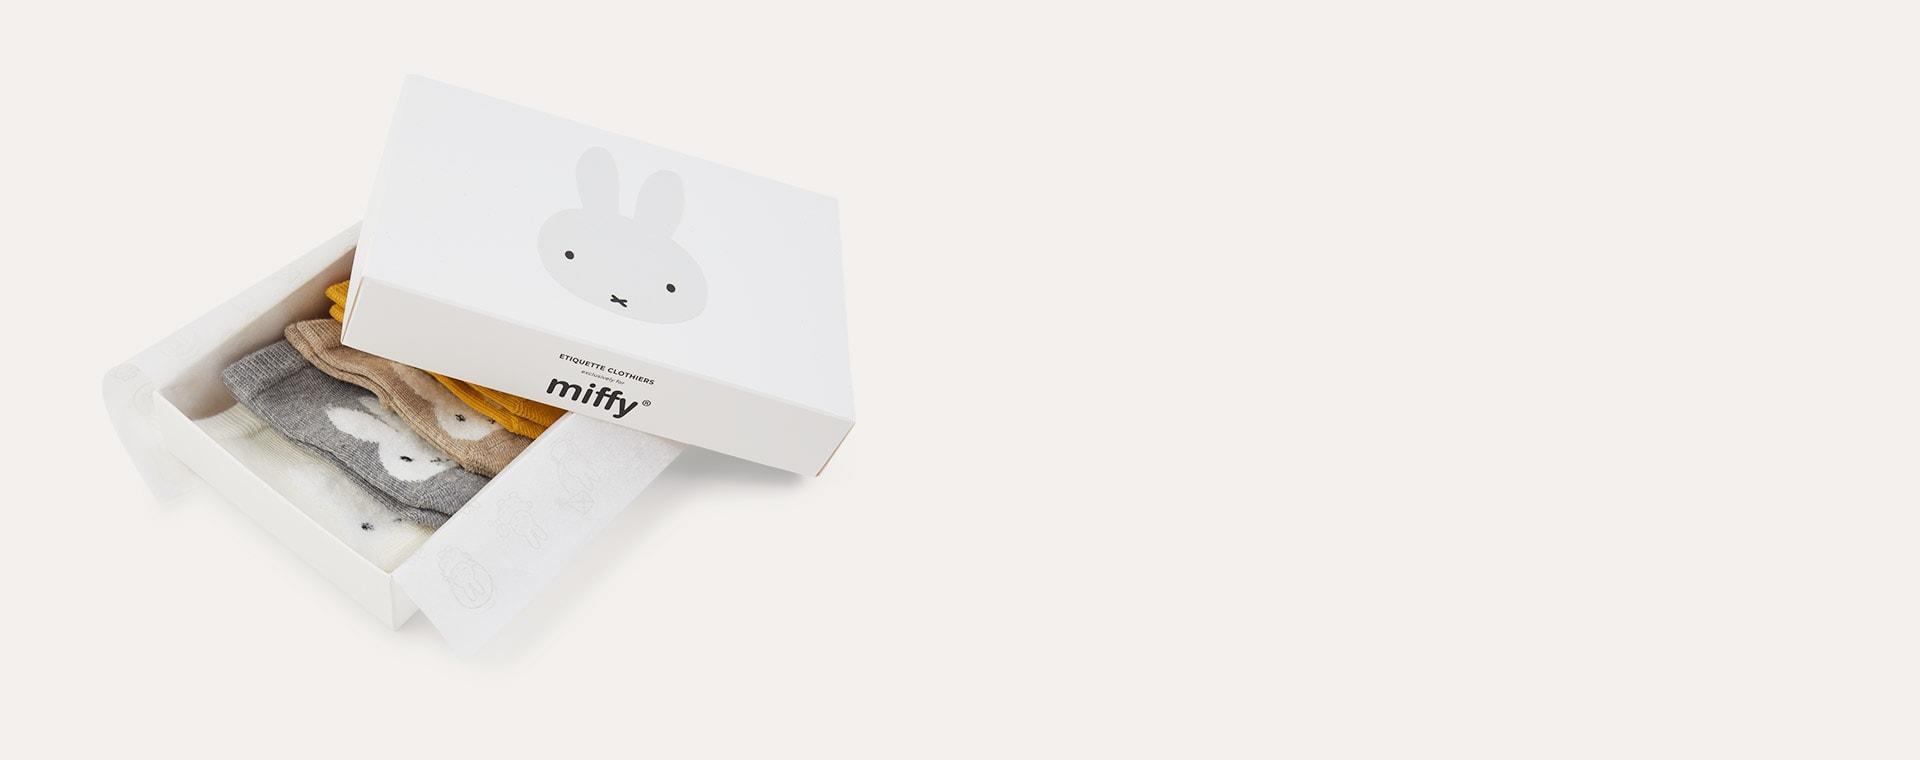 Multi etiquette Miffy x Etiquette Baby Socks 6 Pack 0-12m